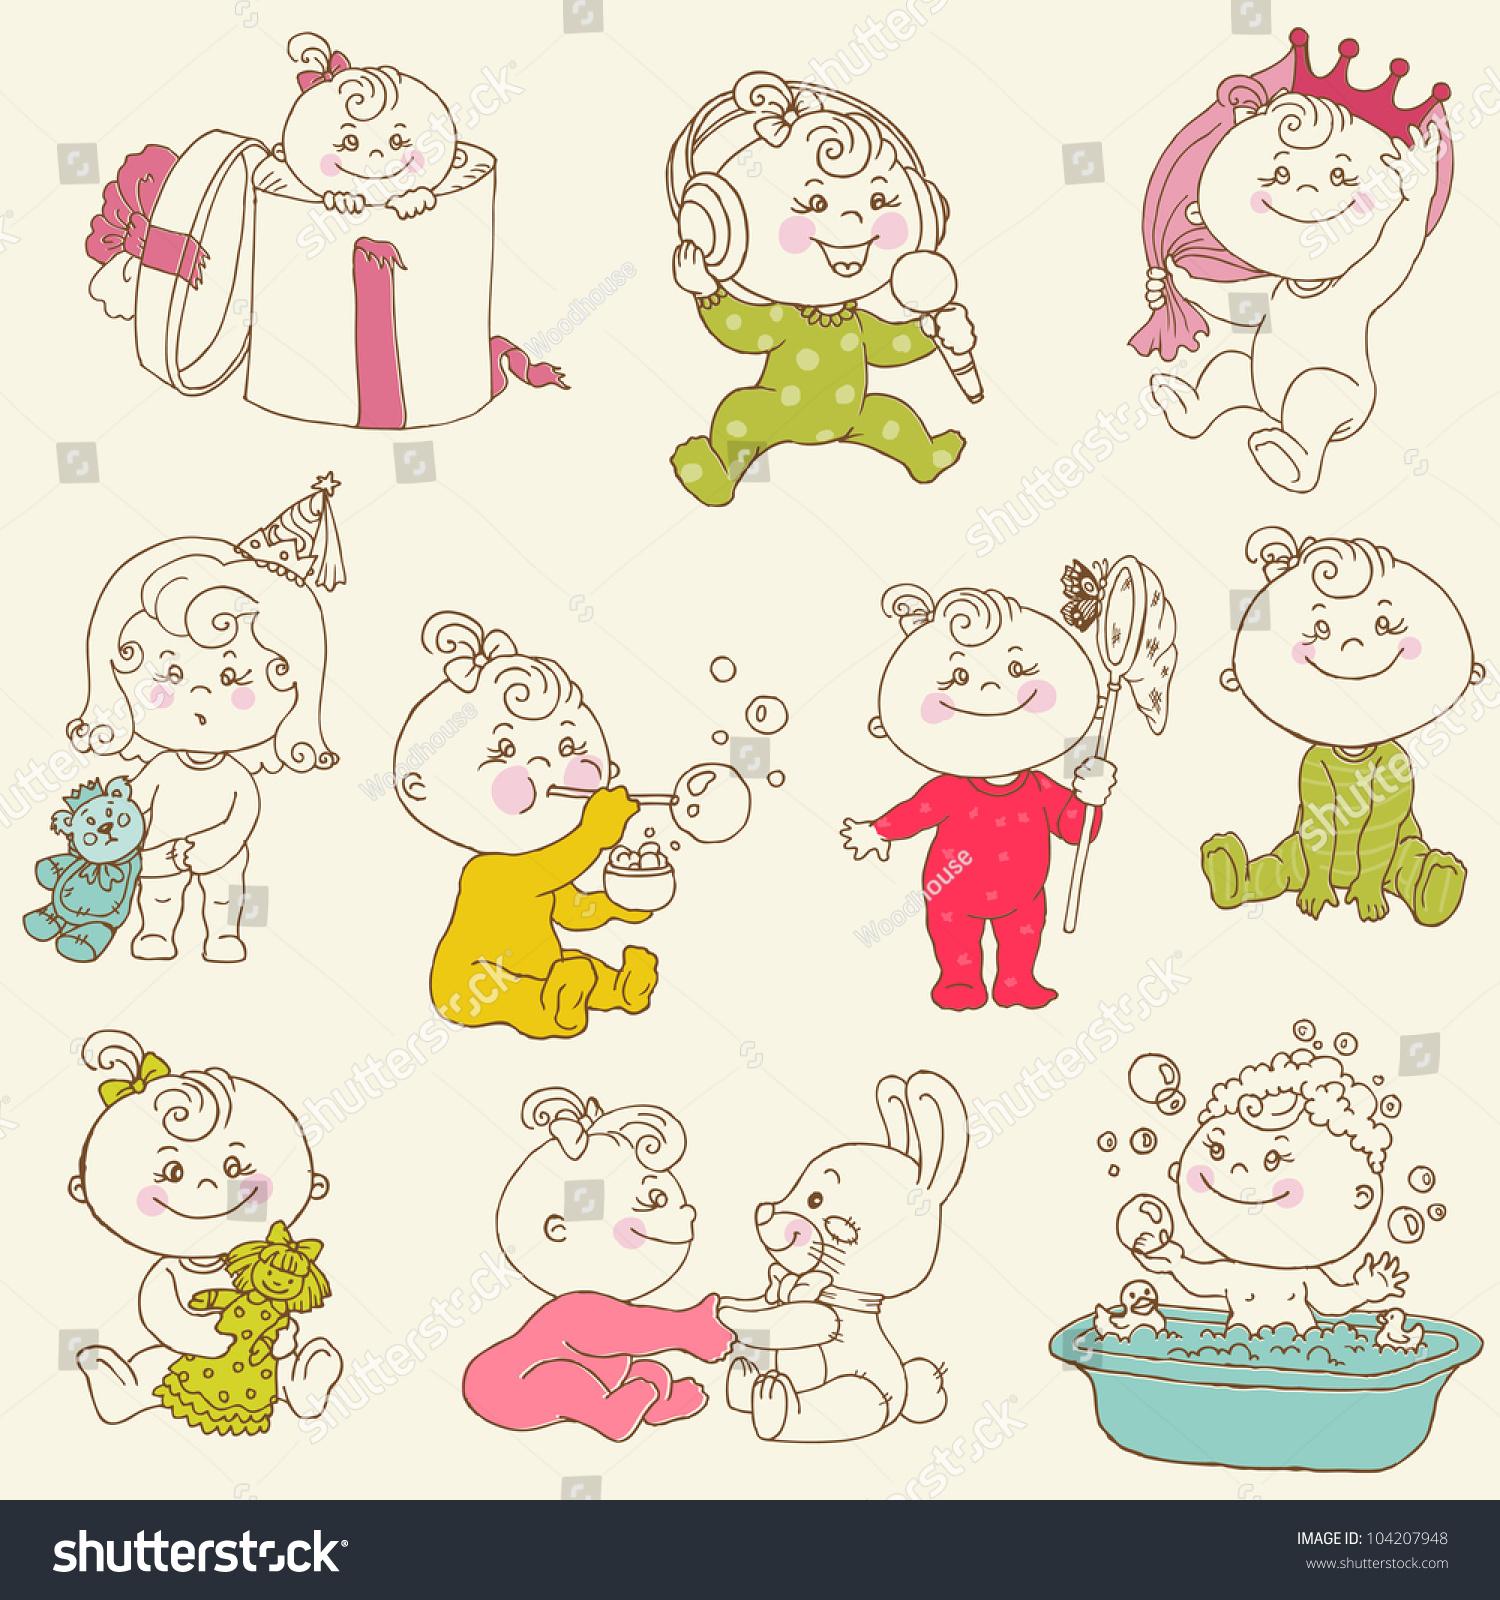 How to scrapbook for baby girl - Baby Girl Cute Doodles For Design And Scrapbook In Vector